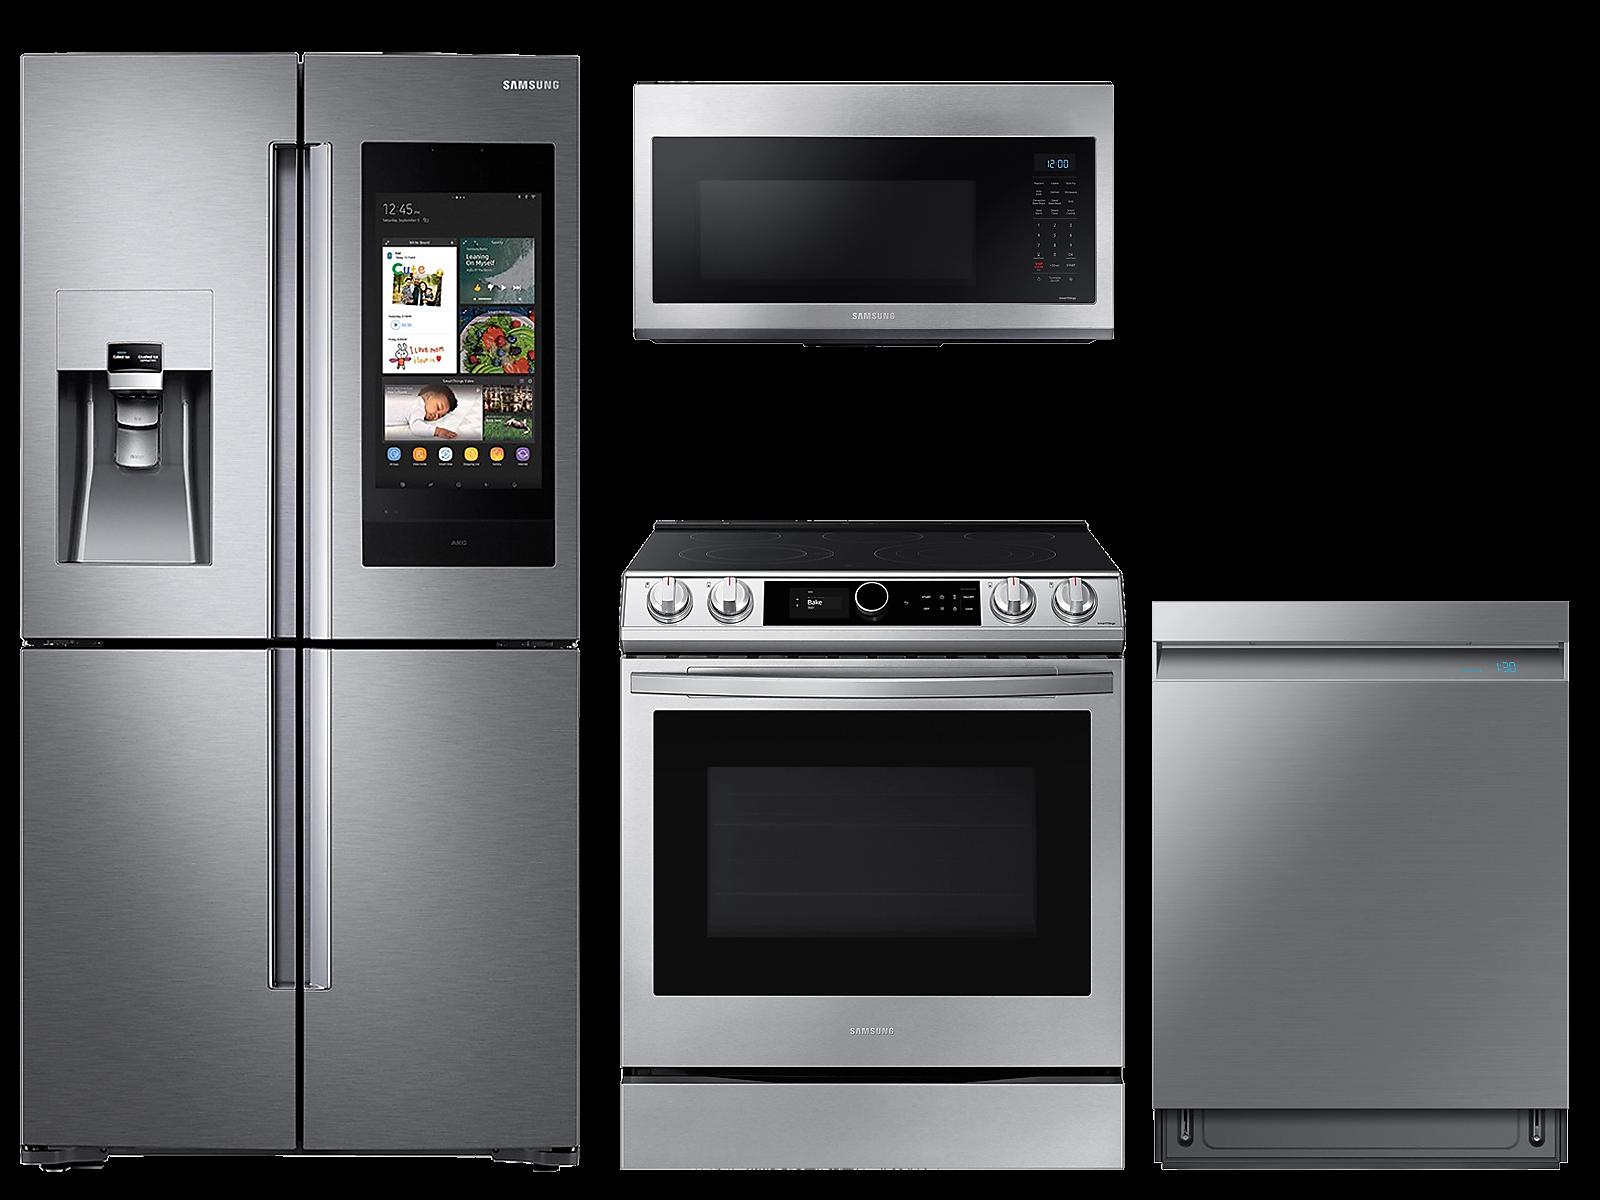 Samsung coupon: Samsung 28 cu. ft. Family HubTM 4-door refrigerator, 6.3 cu. ft. electric range, microwave and Smart Linear dishwasher package(BNDL-1614704148481)